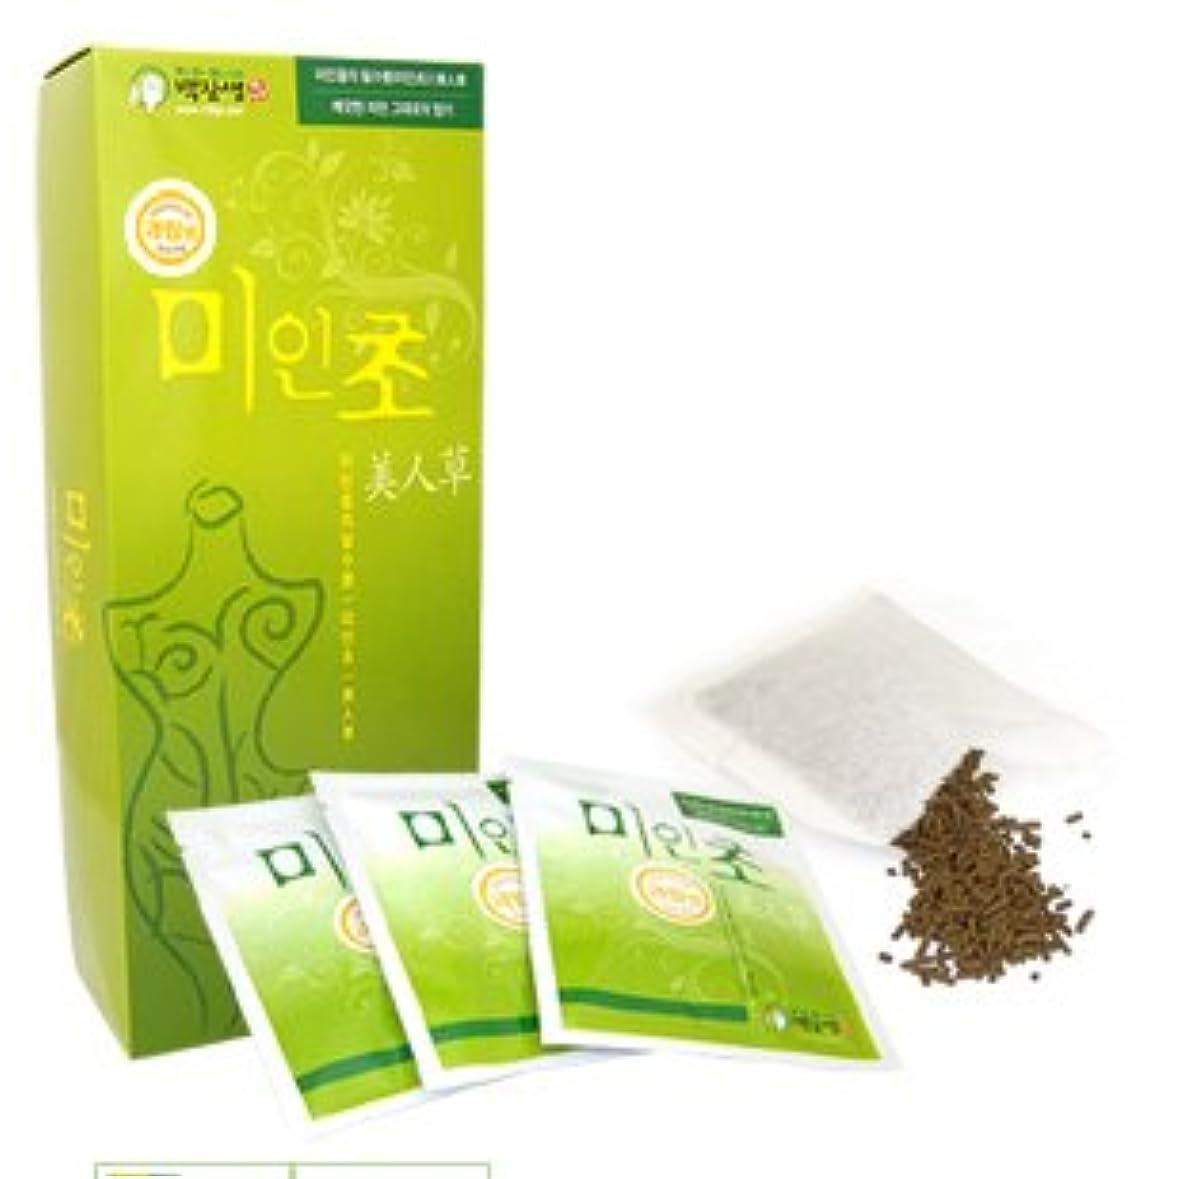 フルーツ野菜可決美人韓国コスメ-美人草1ケース-韓国美肌韓国漢方草-入浴剤